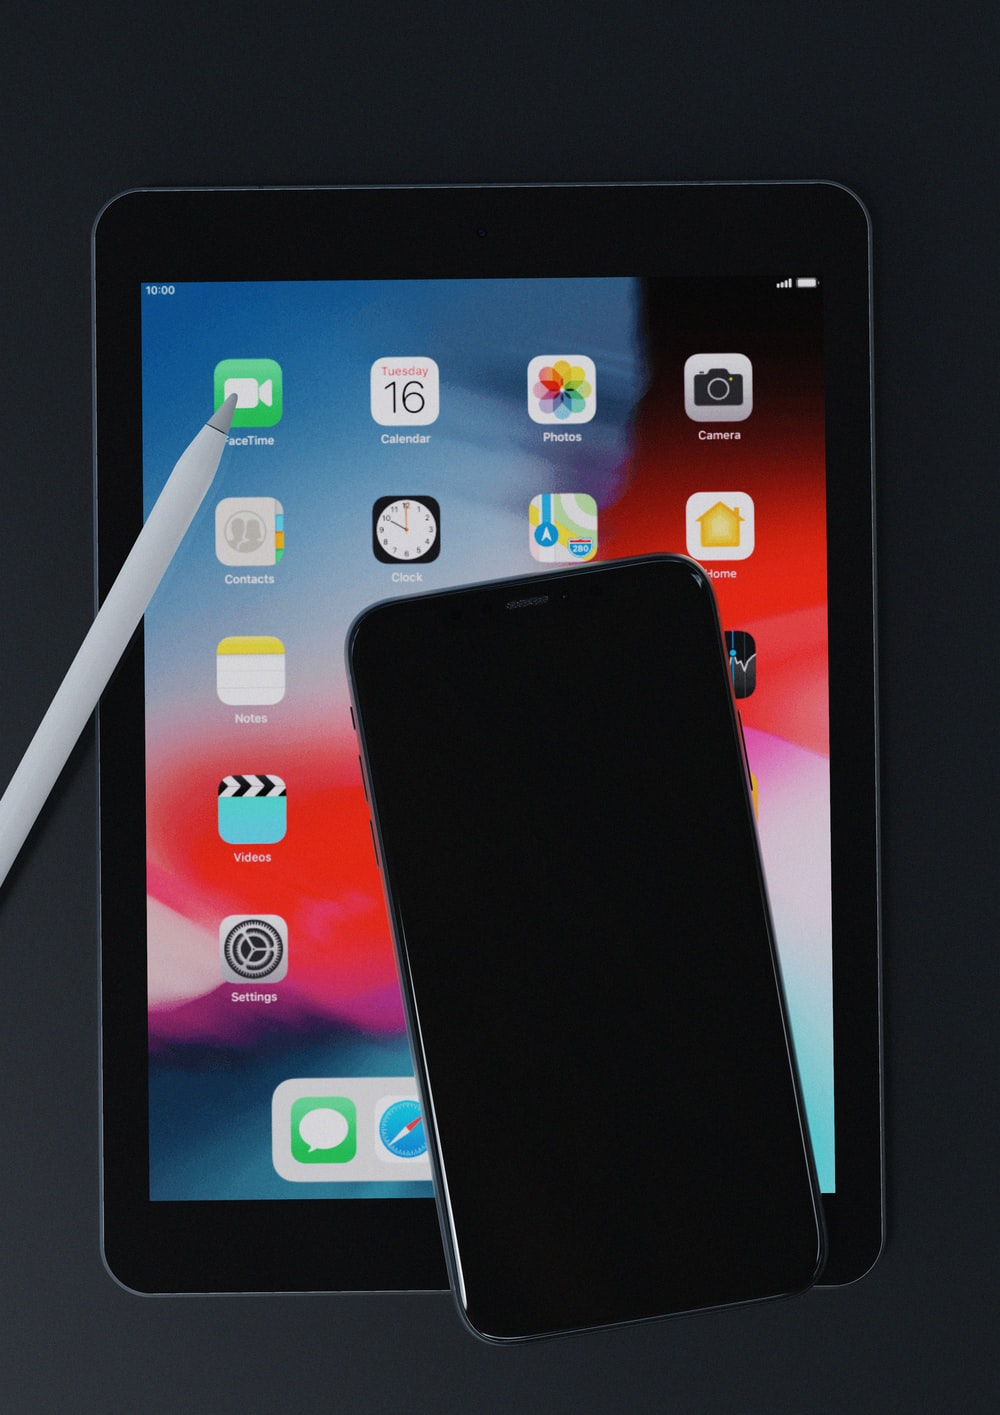 black iphone 5 on white ipad